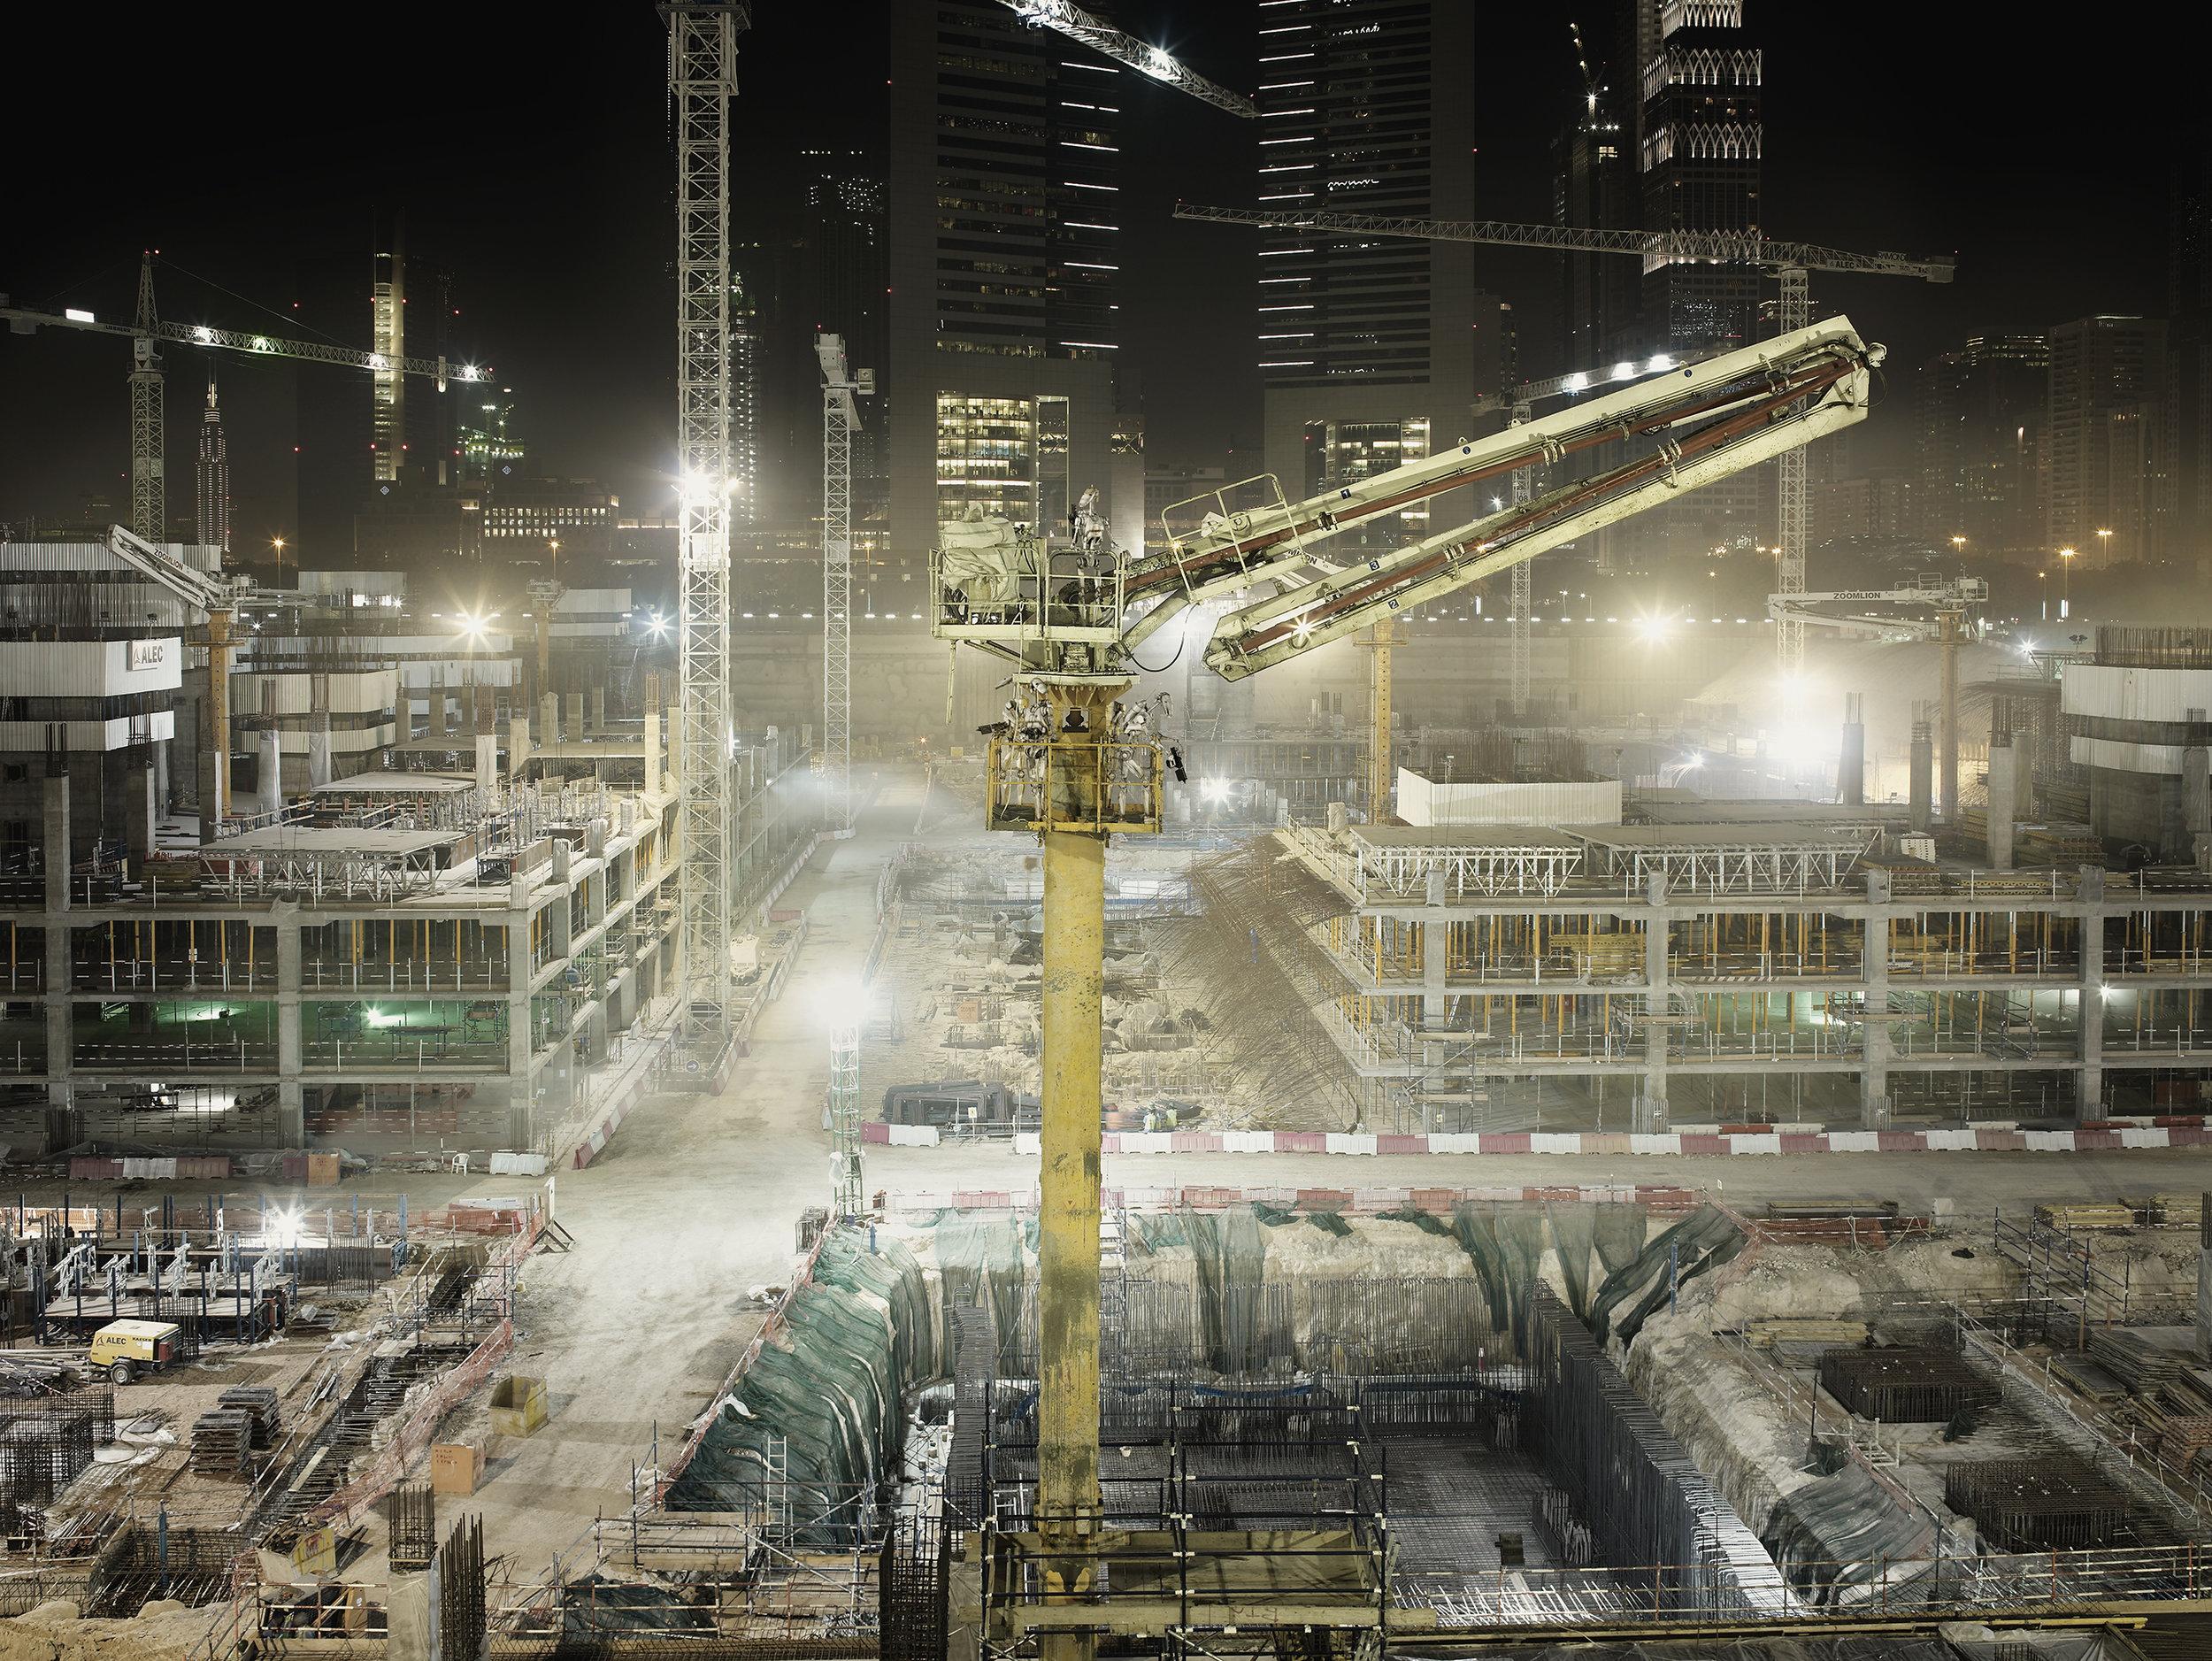 Nightwatch Construction Site. 2009